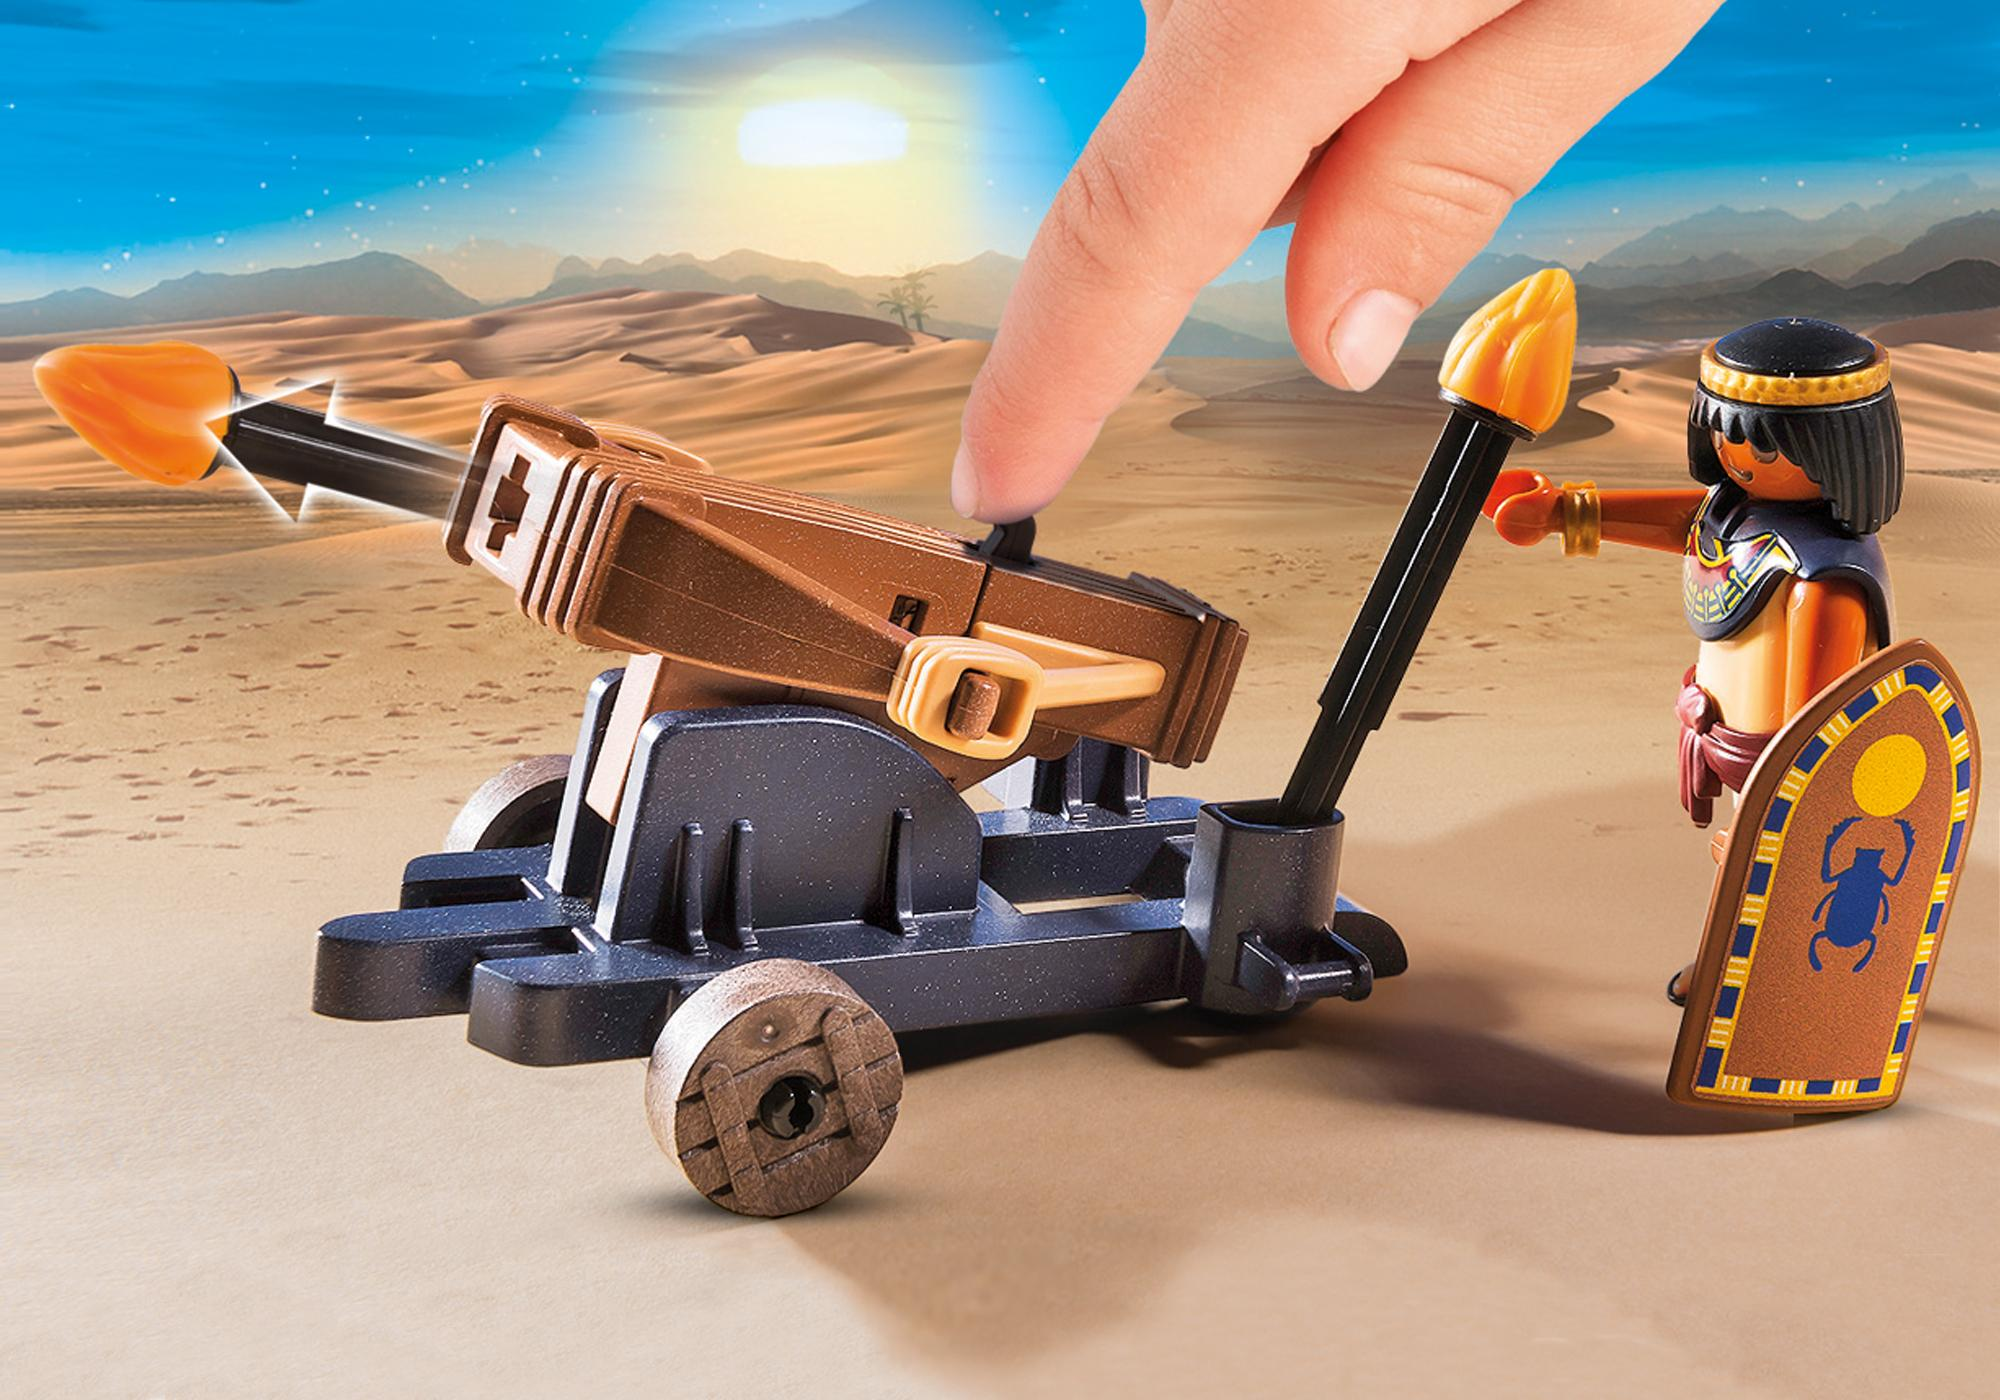 http://media.playmobil.com/i/playmobil/5388_product_extra1/Римляне и Египтяне: Египетский солдат с Баллистой